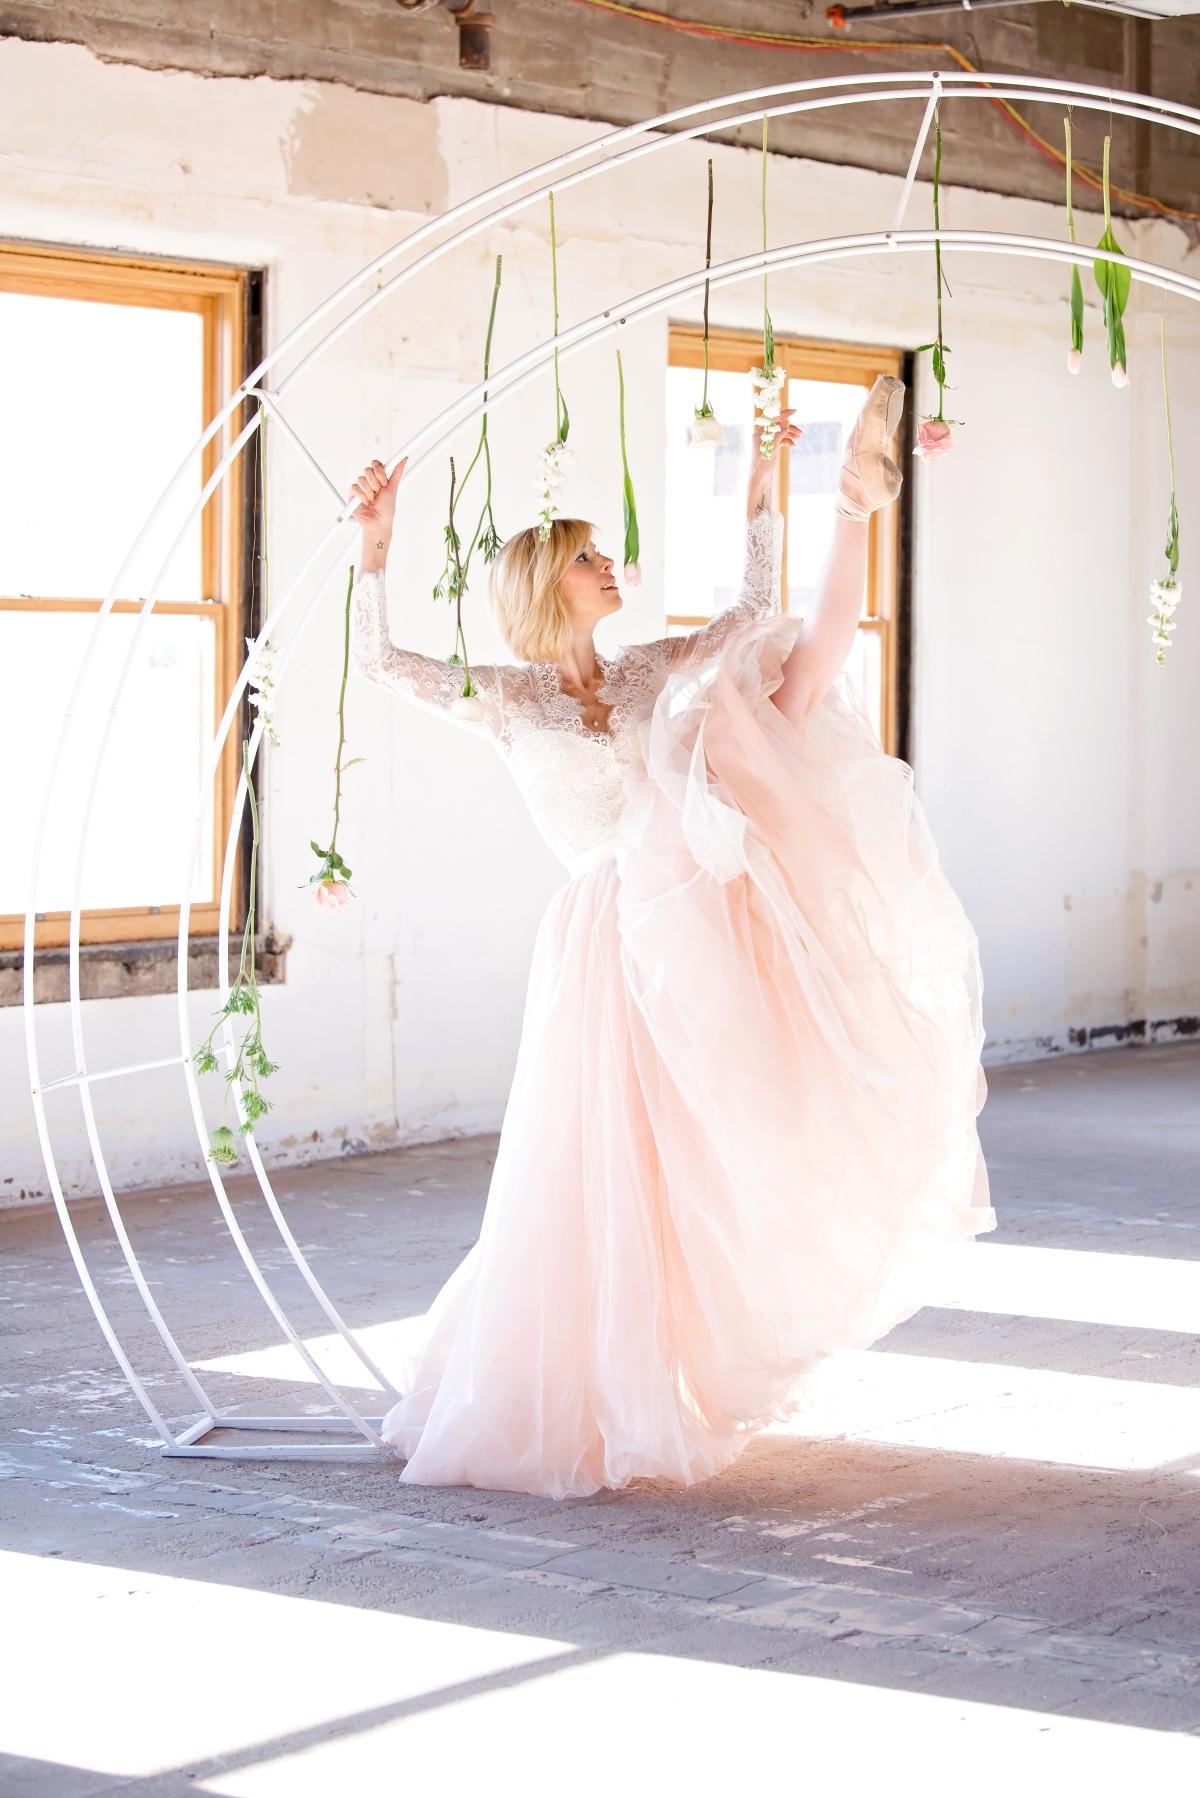 Banque Loft Ballerina Shoot by Local WeddingPhotographer